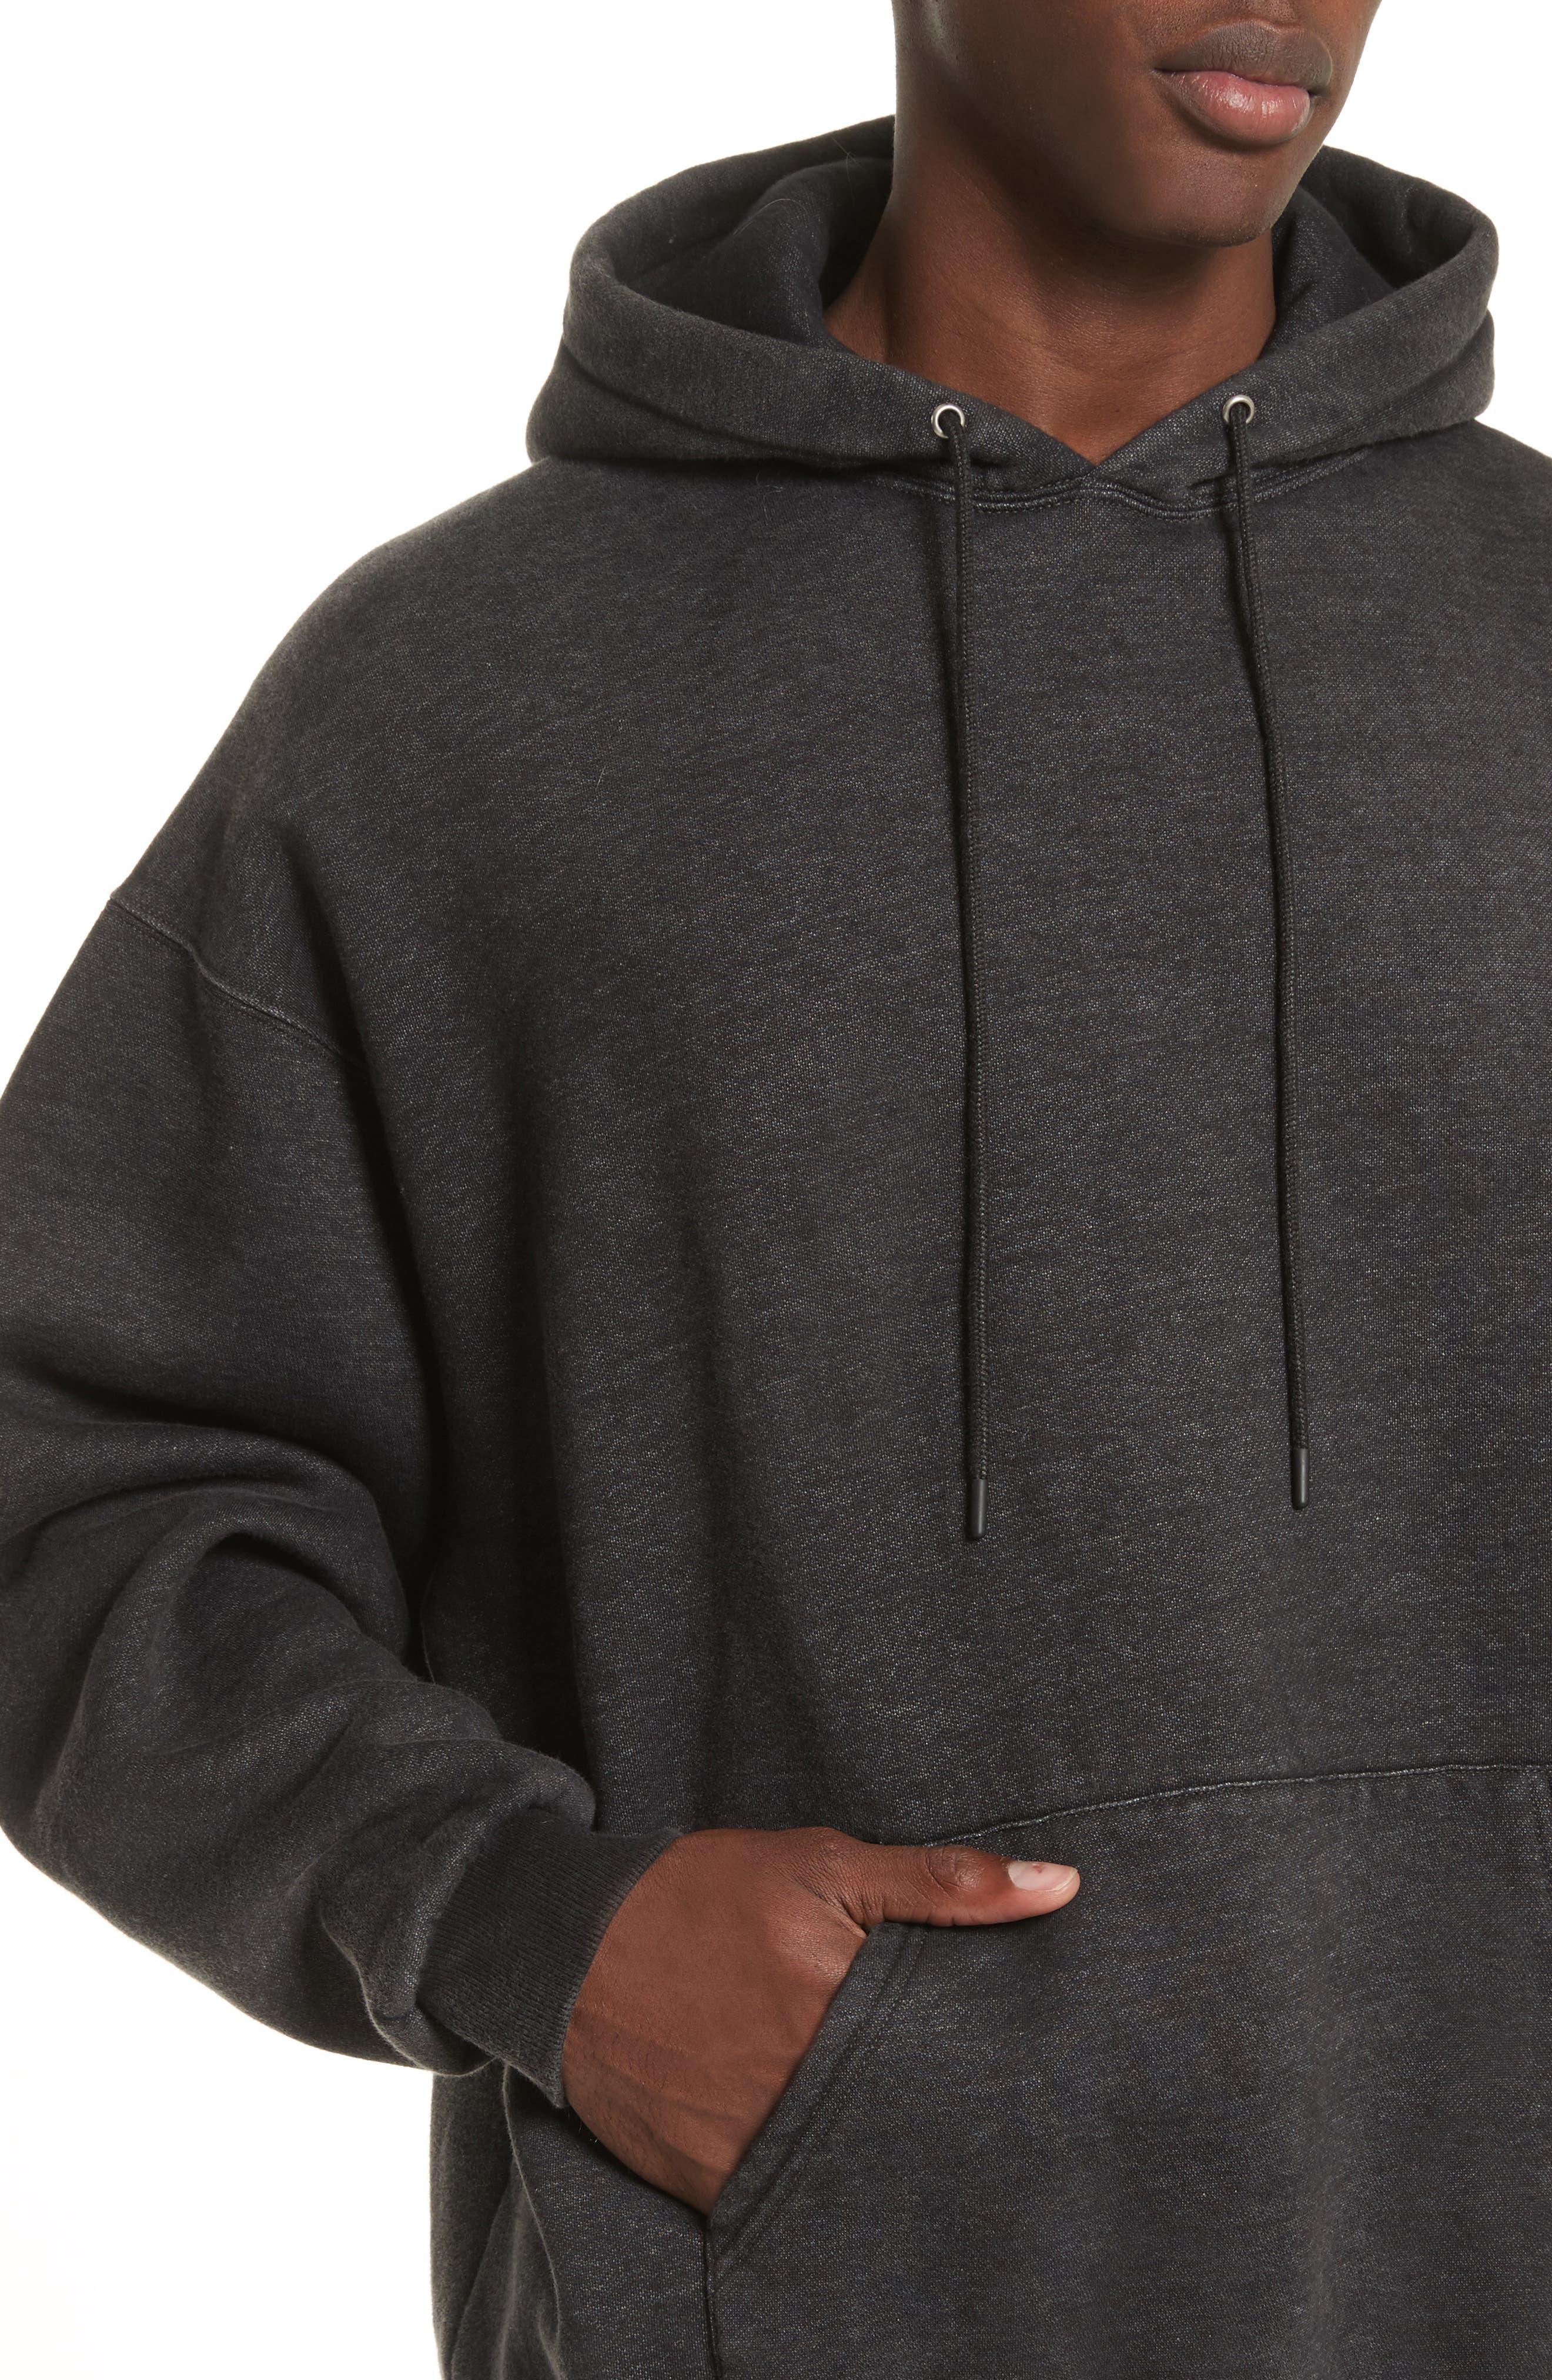 Oversize Pullover Hoodie,                             Alternate thumbnail 4, color,                             Acid Black